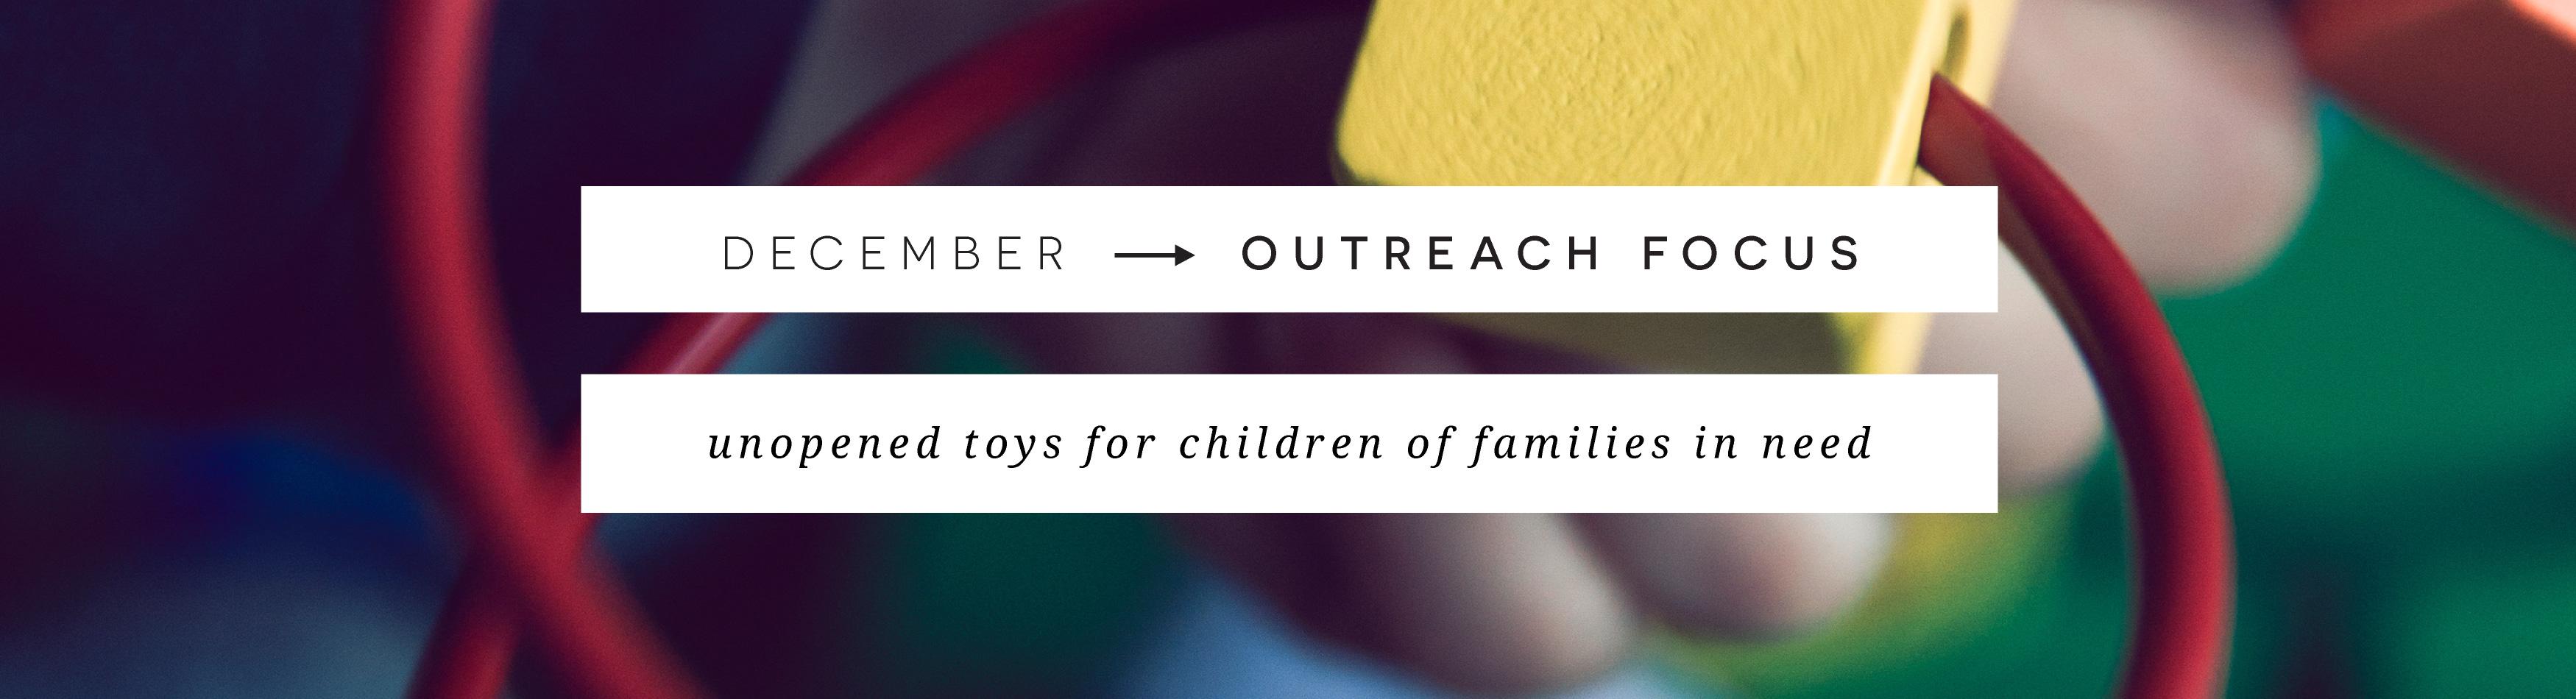 december-outreach-focus_web-banner-112917